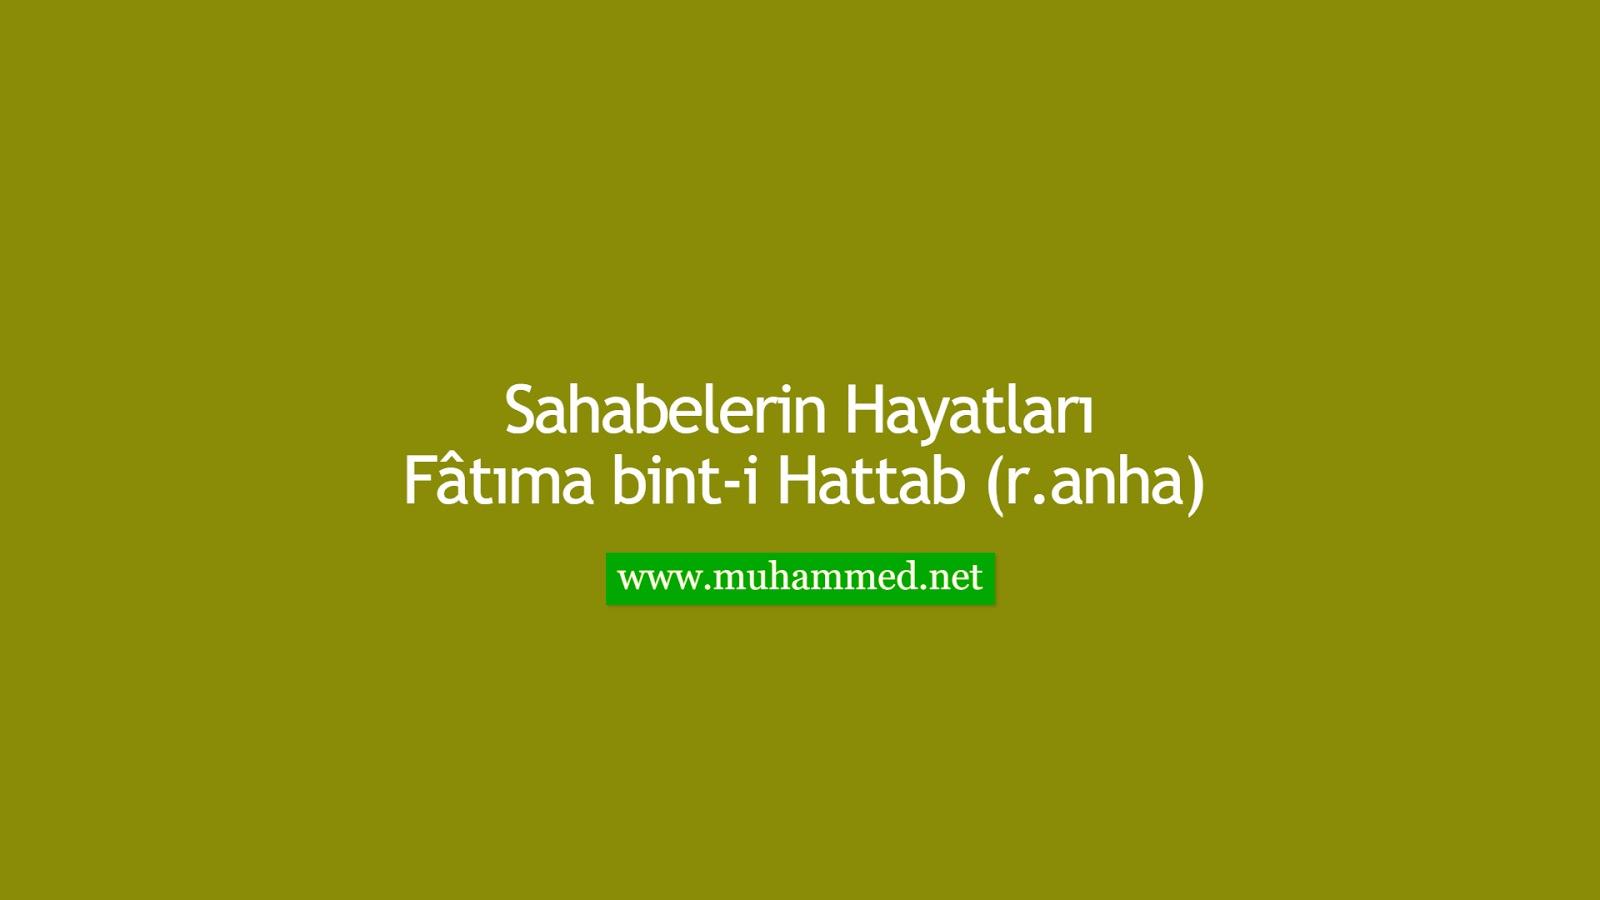 Fâtıma bint-i Hattab (r.anha)